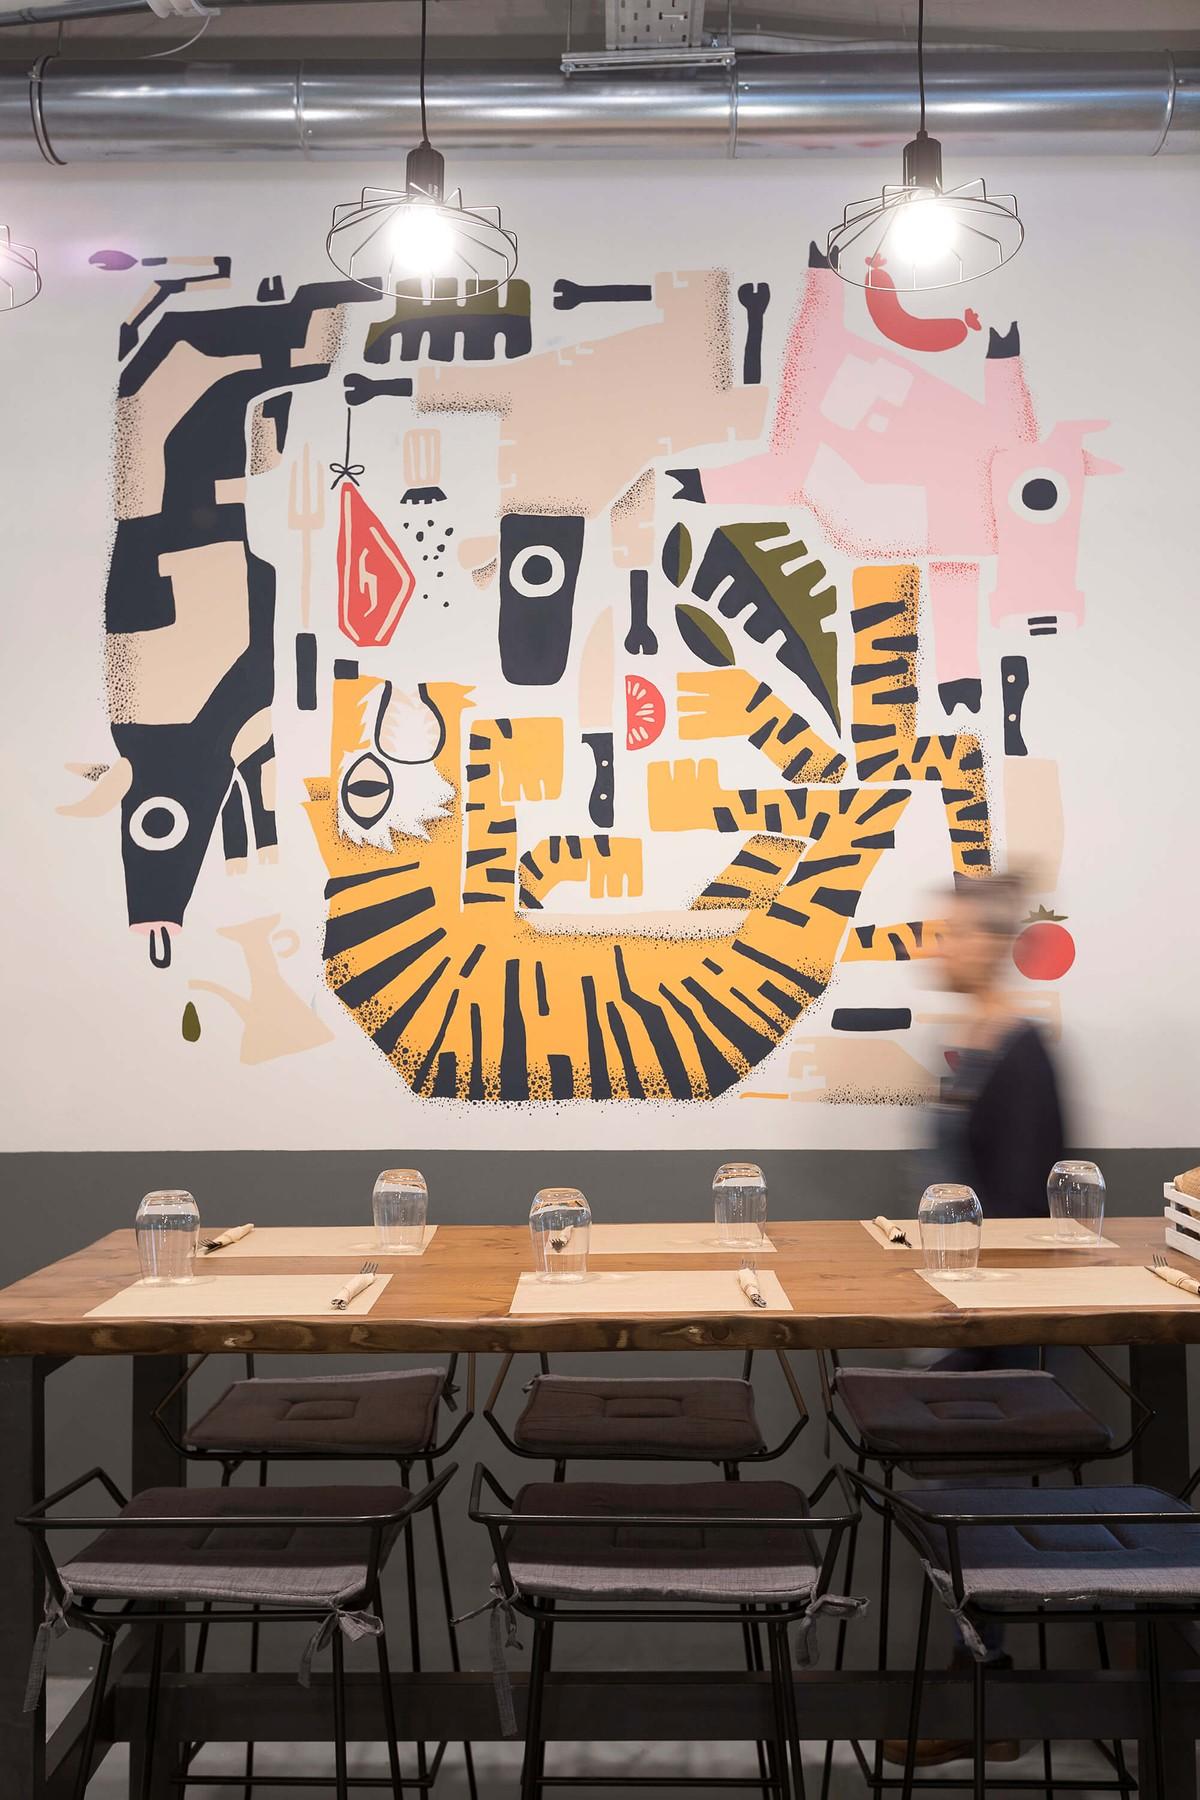 phantom-food-factory-mural-overview-front.jpg